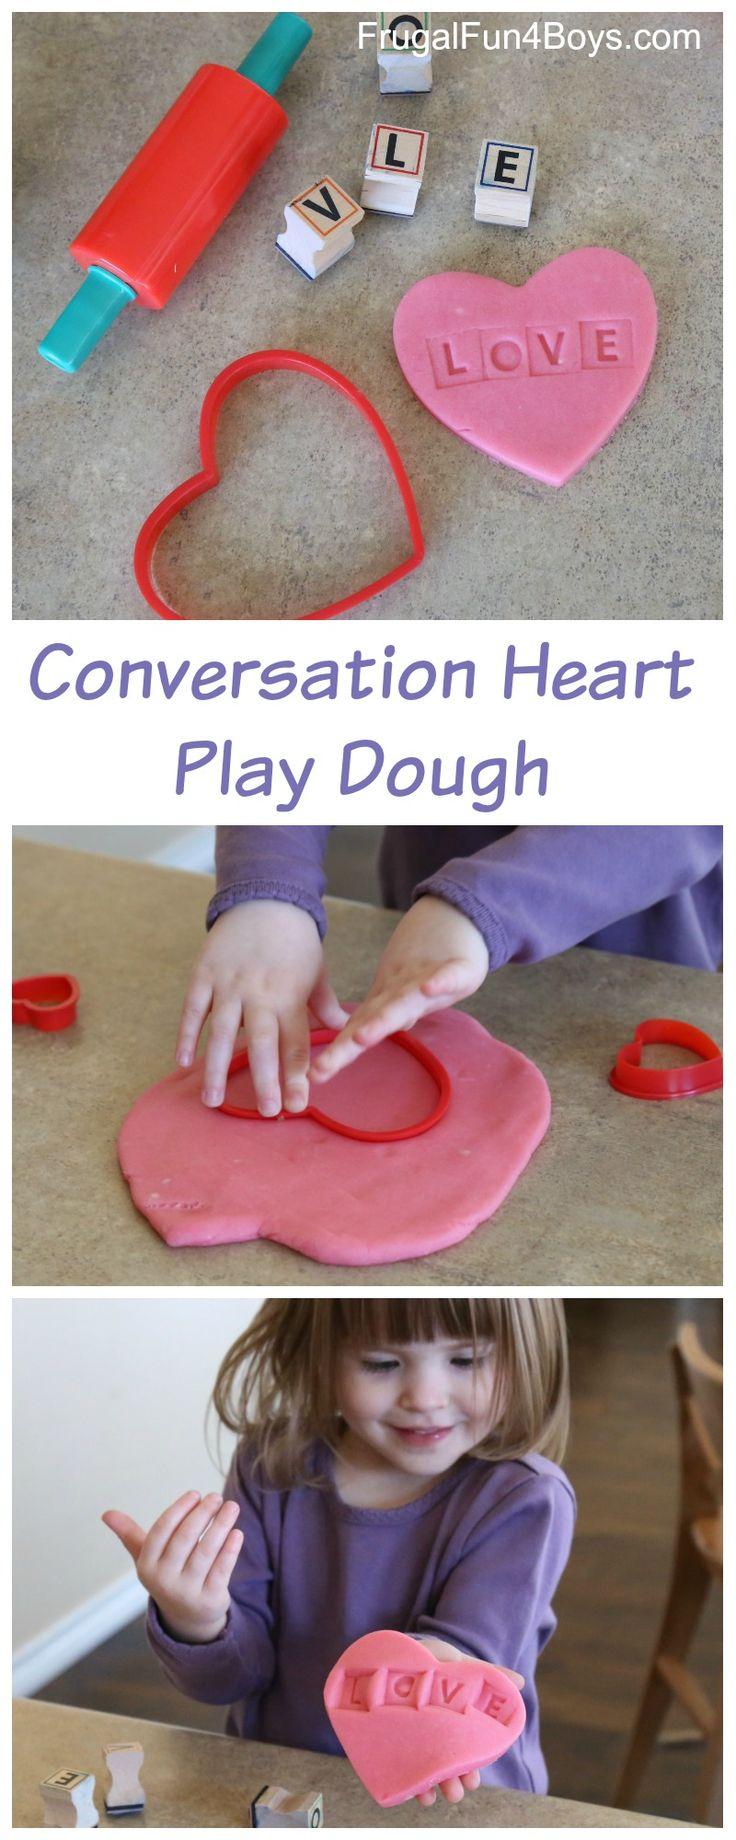 974 best Valentine's Day for Kids images on Pinterest | Valentine ...